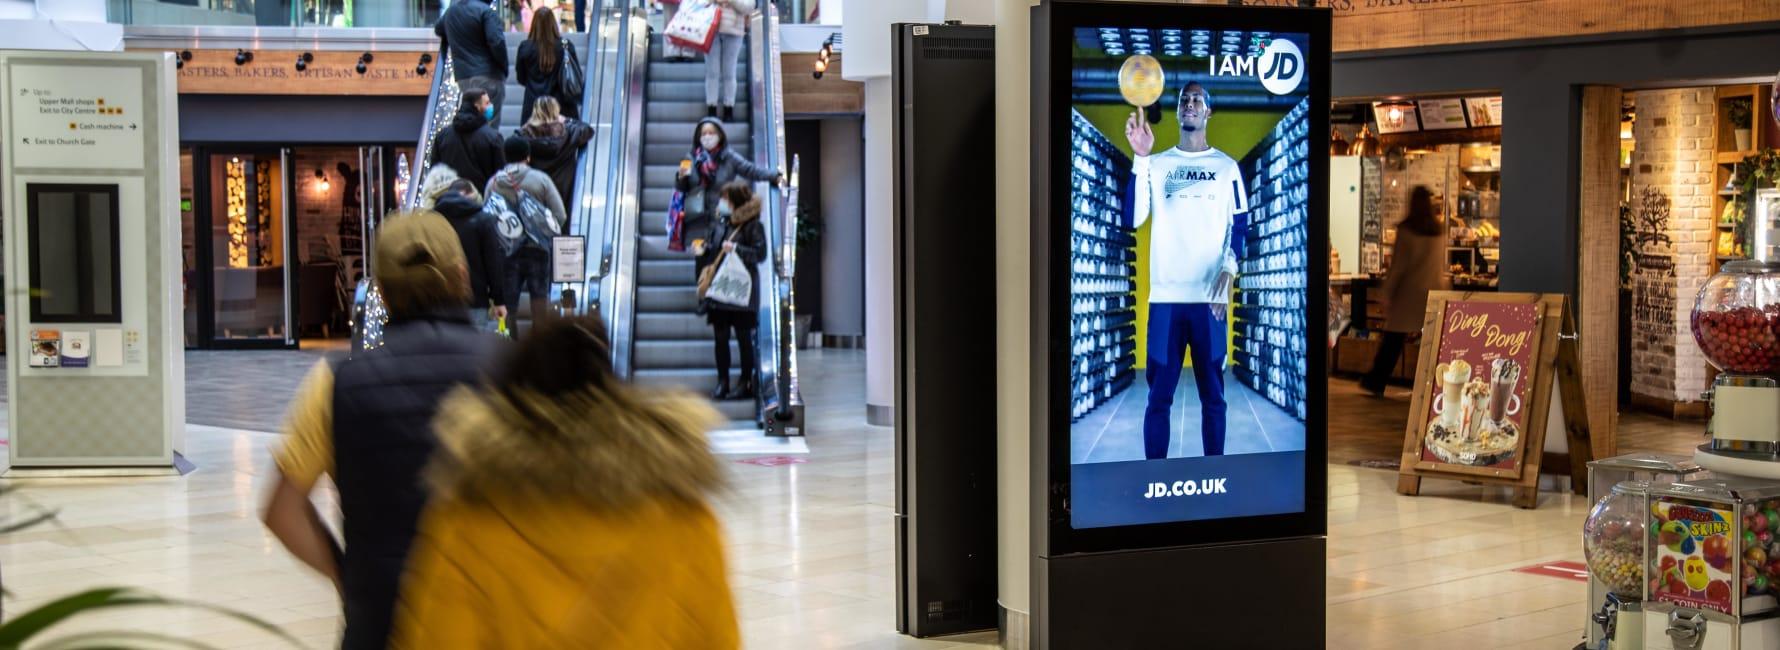 Malls Live Screen in Birmingham